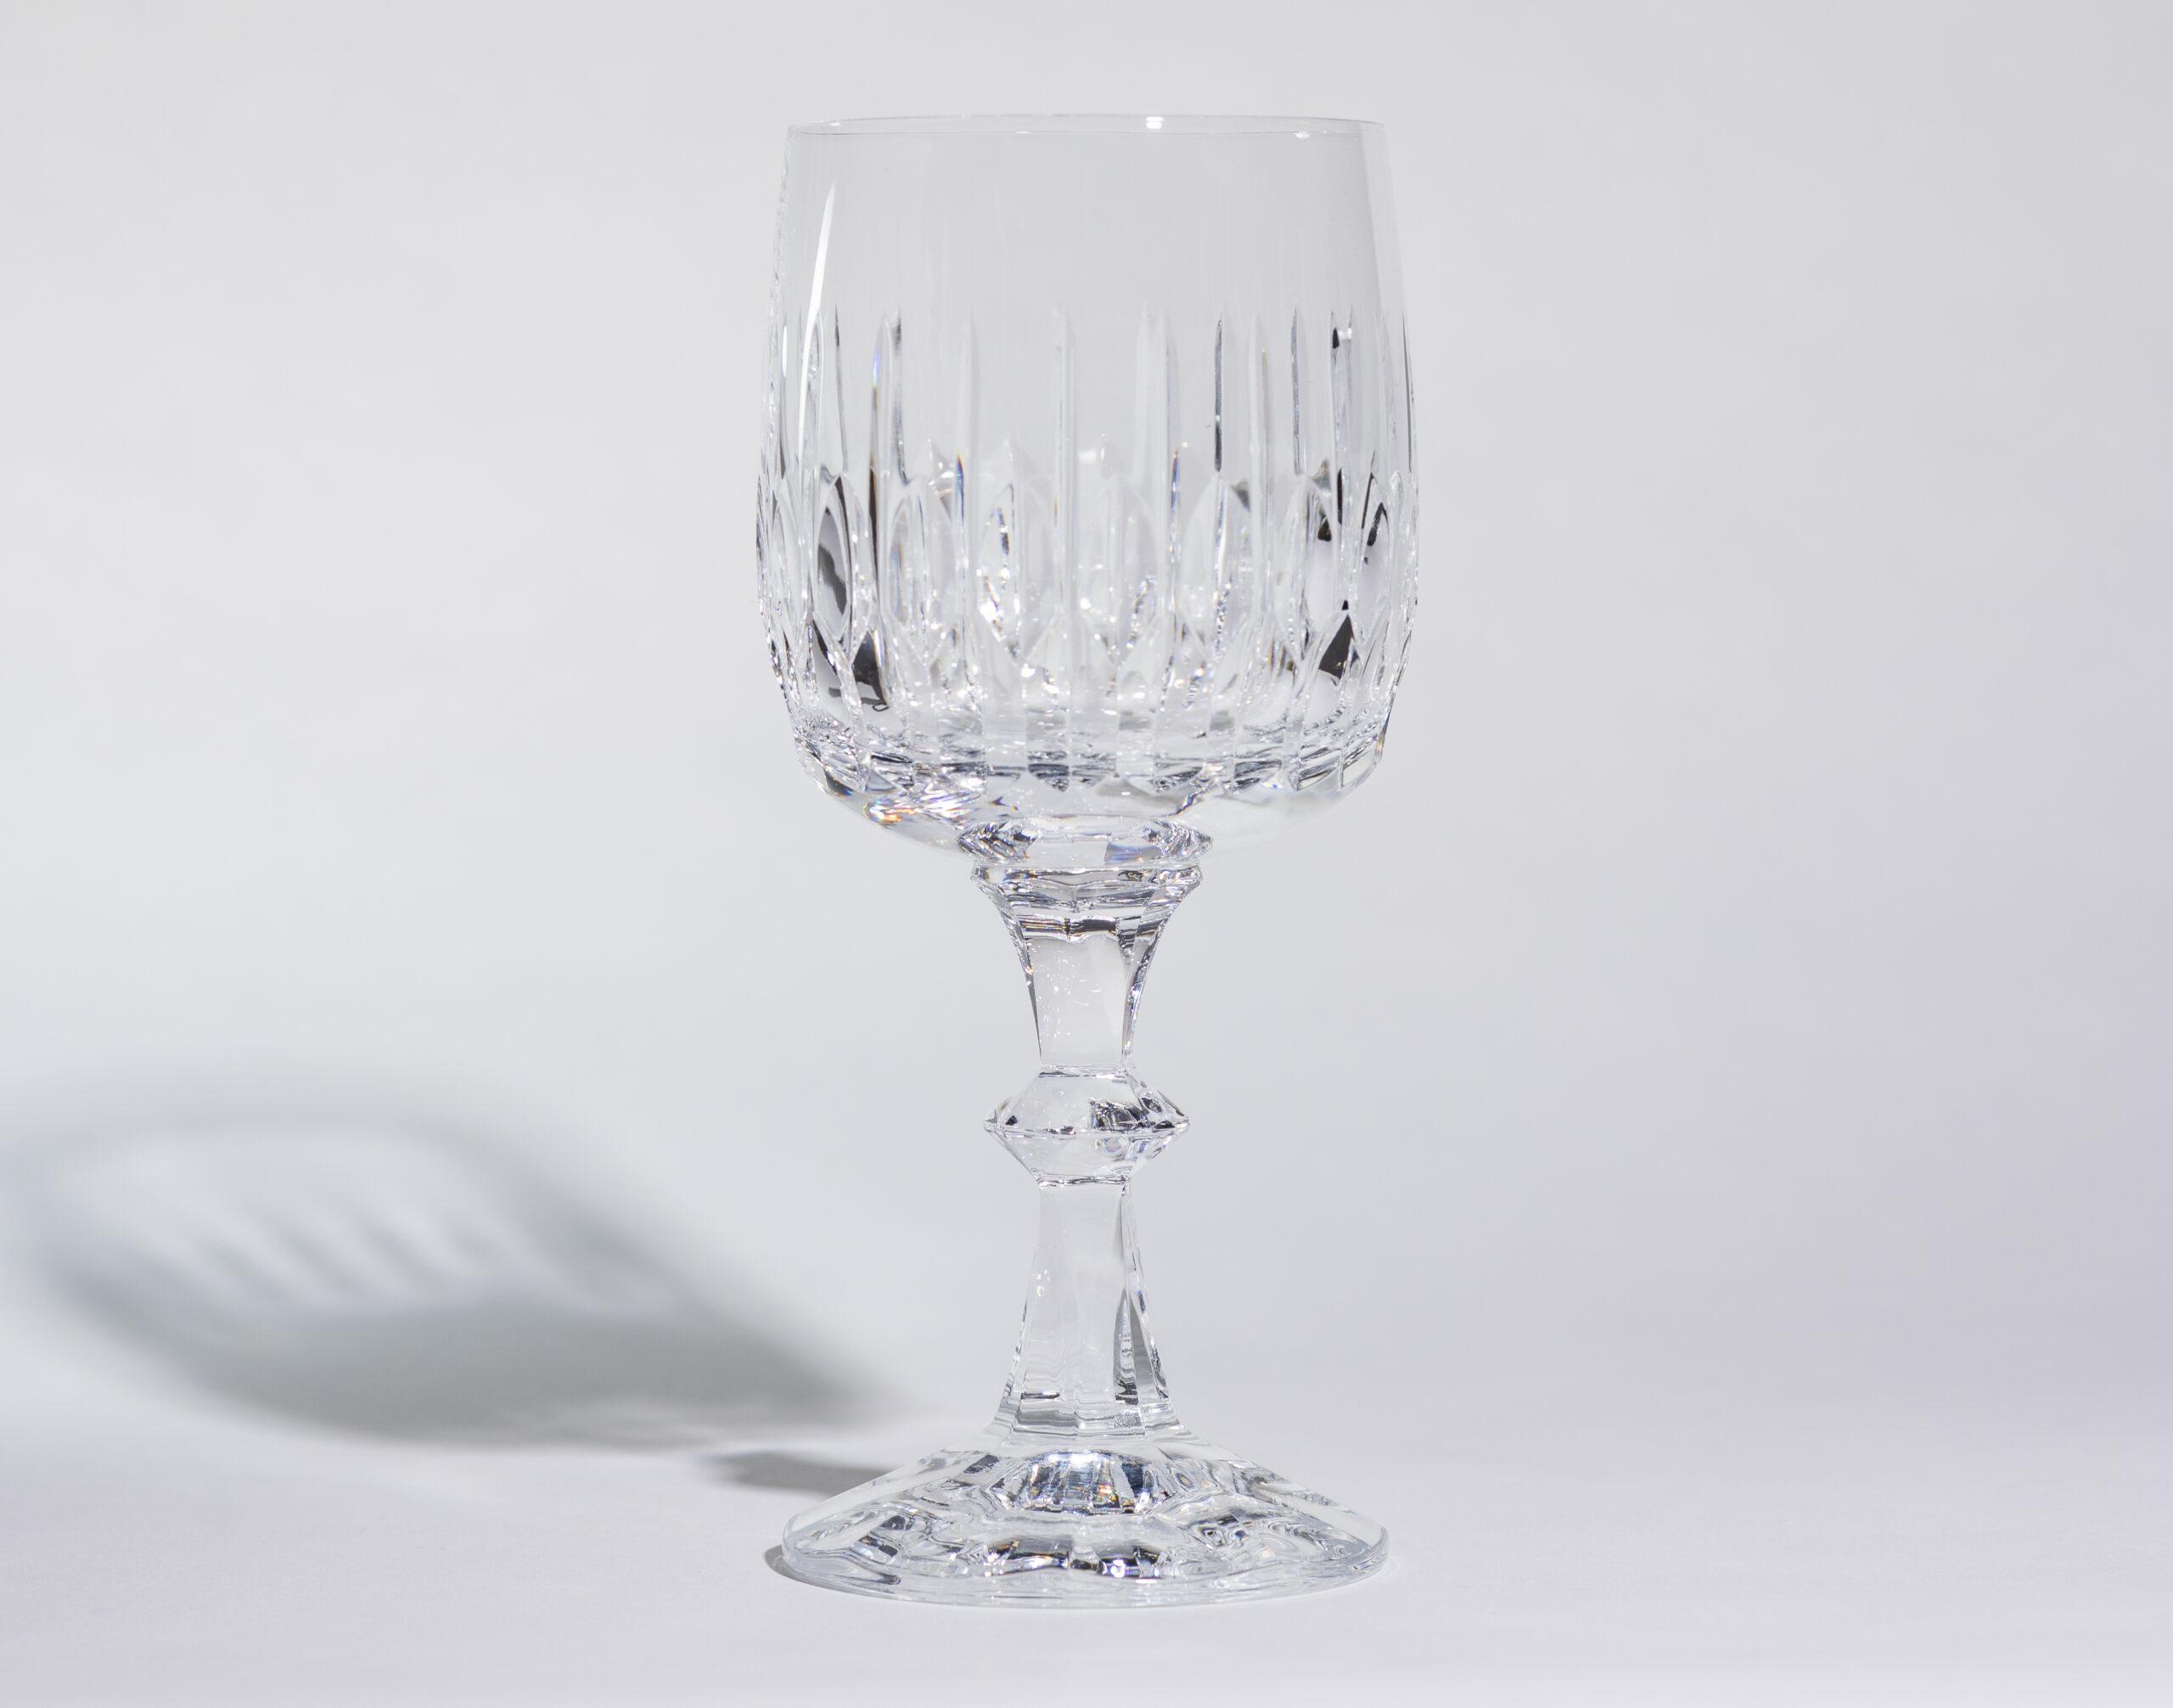 Wine glasses (8oz, stemmed)